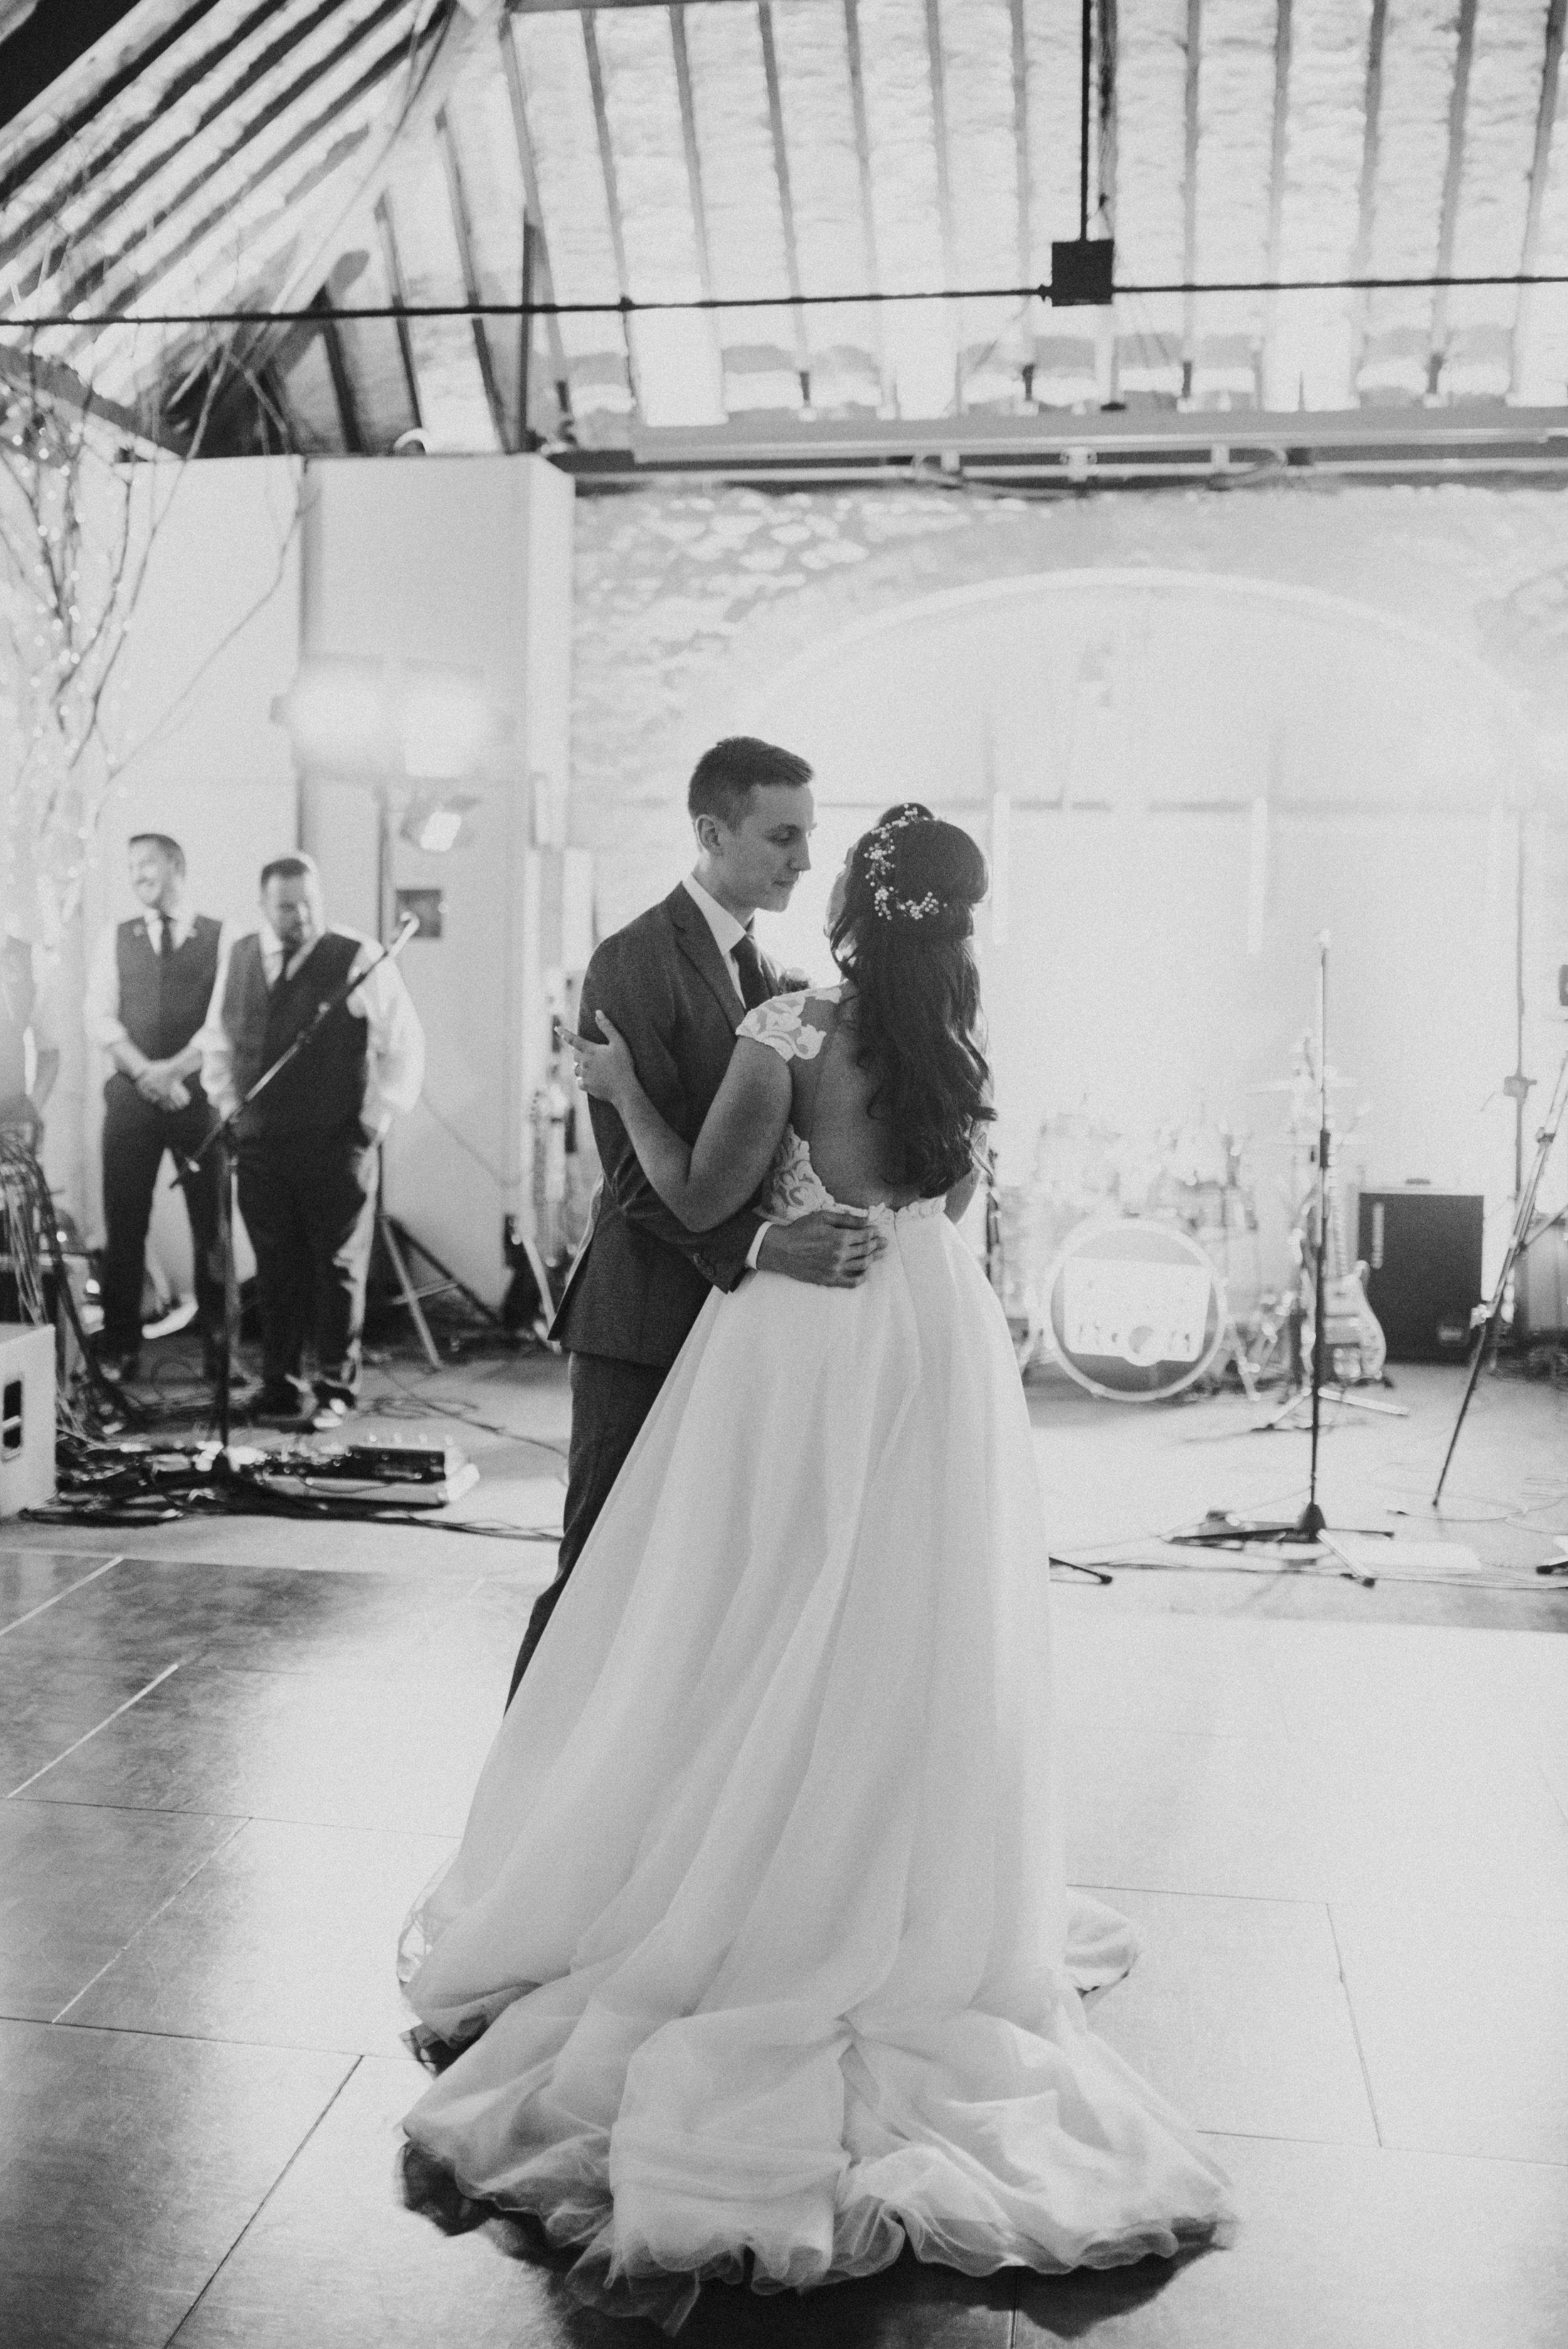 larchfield estate wedding, wedding venues northern ireland, barn wedding venues northern ireland, wedding photos larchfield estate, shane todd wedding, irish wedding, first dance (1).jpg